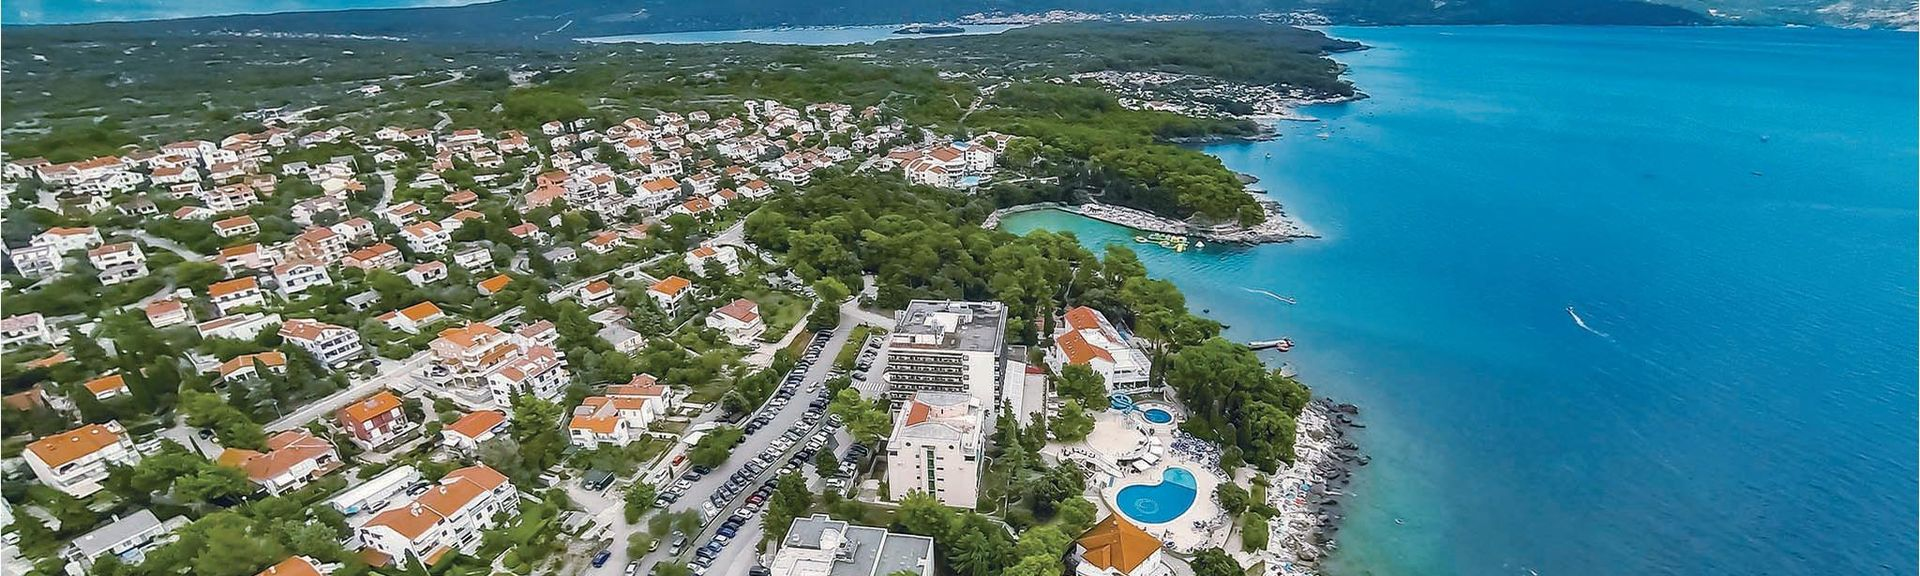 Porat, Malinska-Dubašnica, Regione litoraneo-montana, Croazia